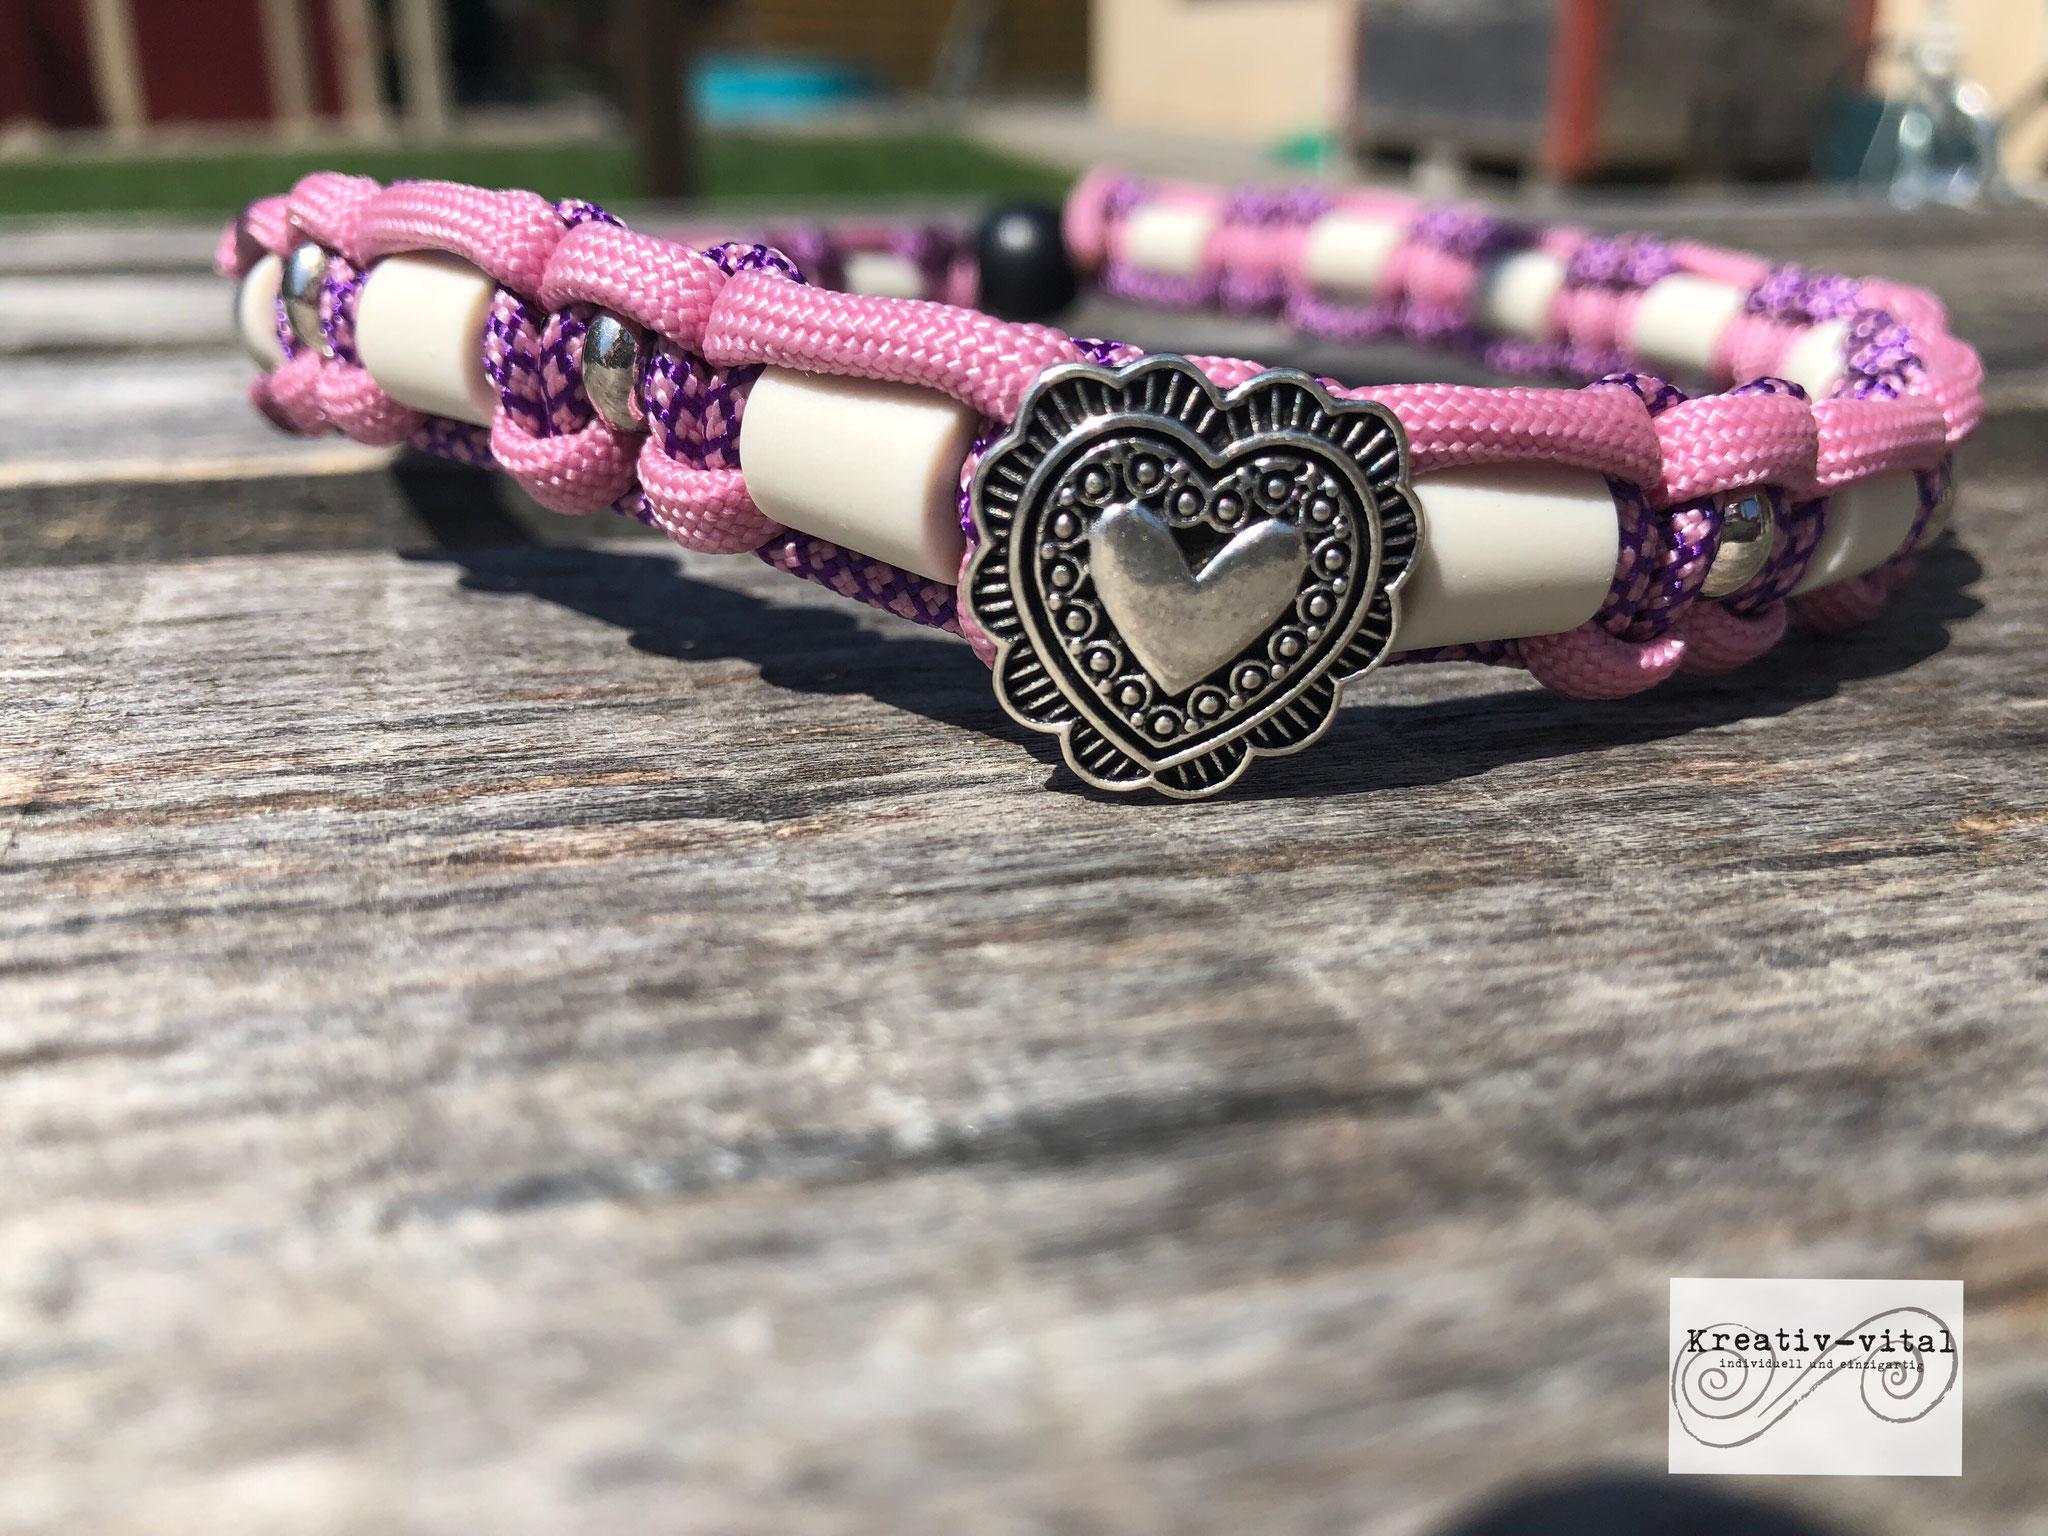 EM Keramik Halsband für Hund/Katze 46-50cm Halsumfang Lavendel/Lila